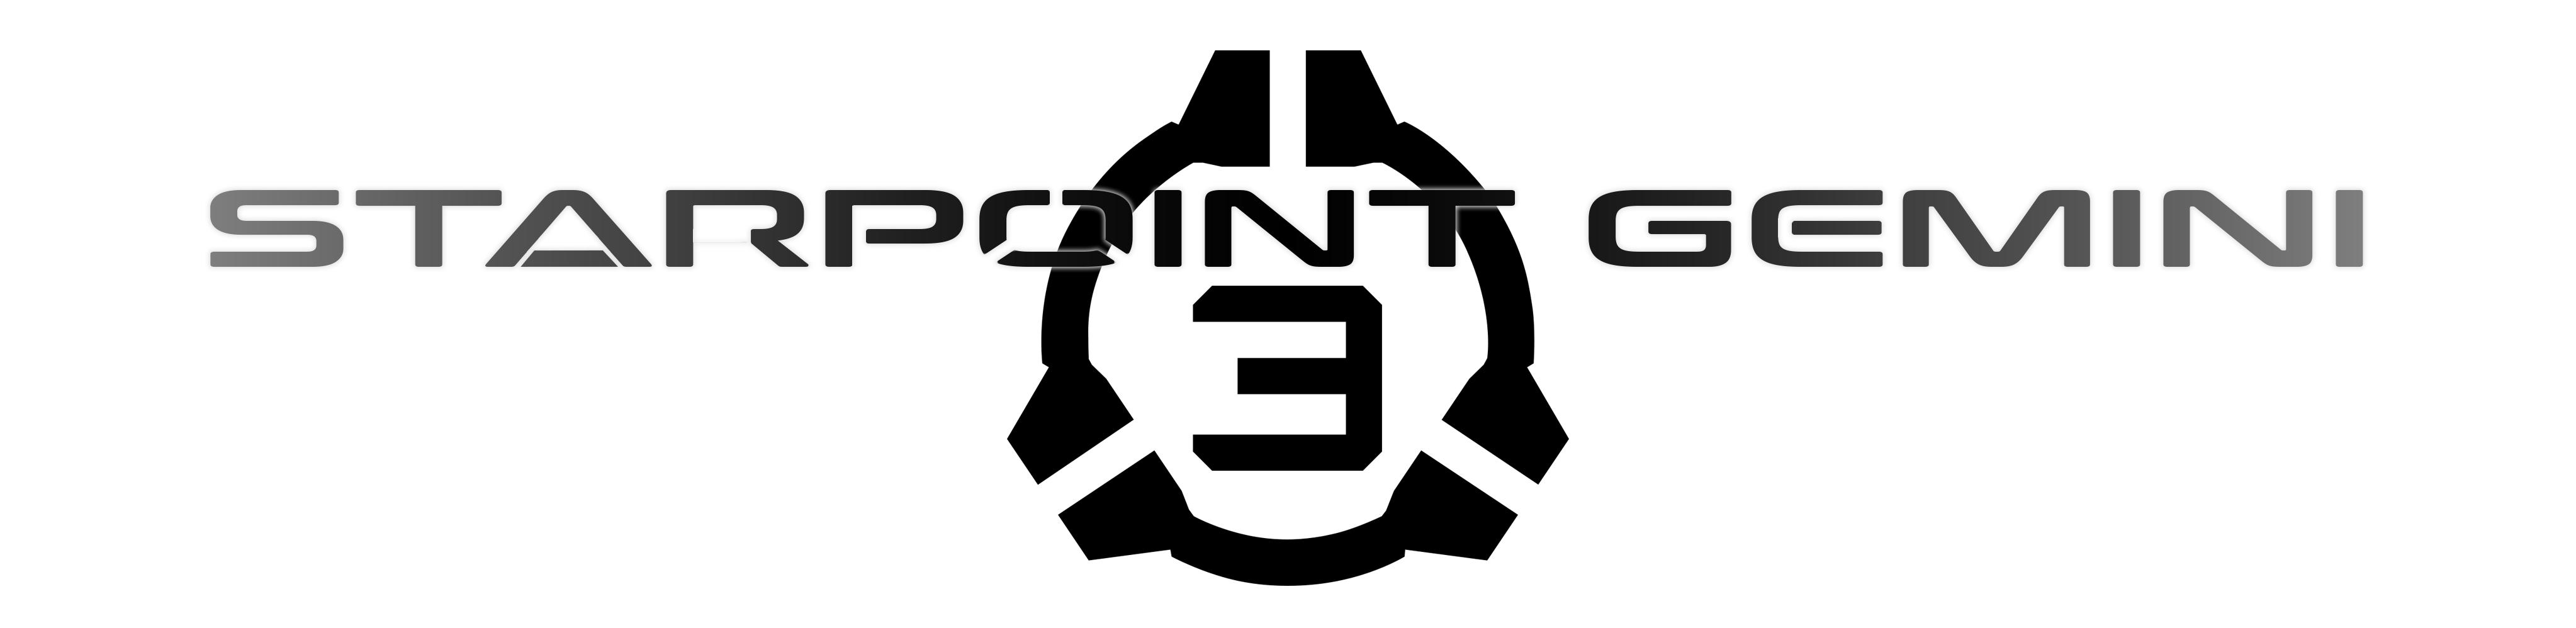 Starpoint Gemini 3 logo